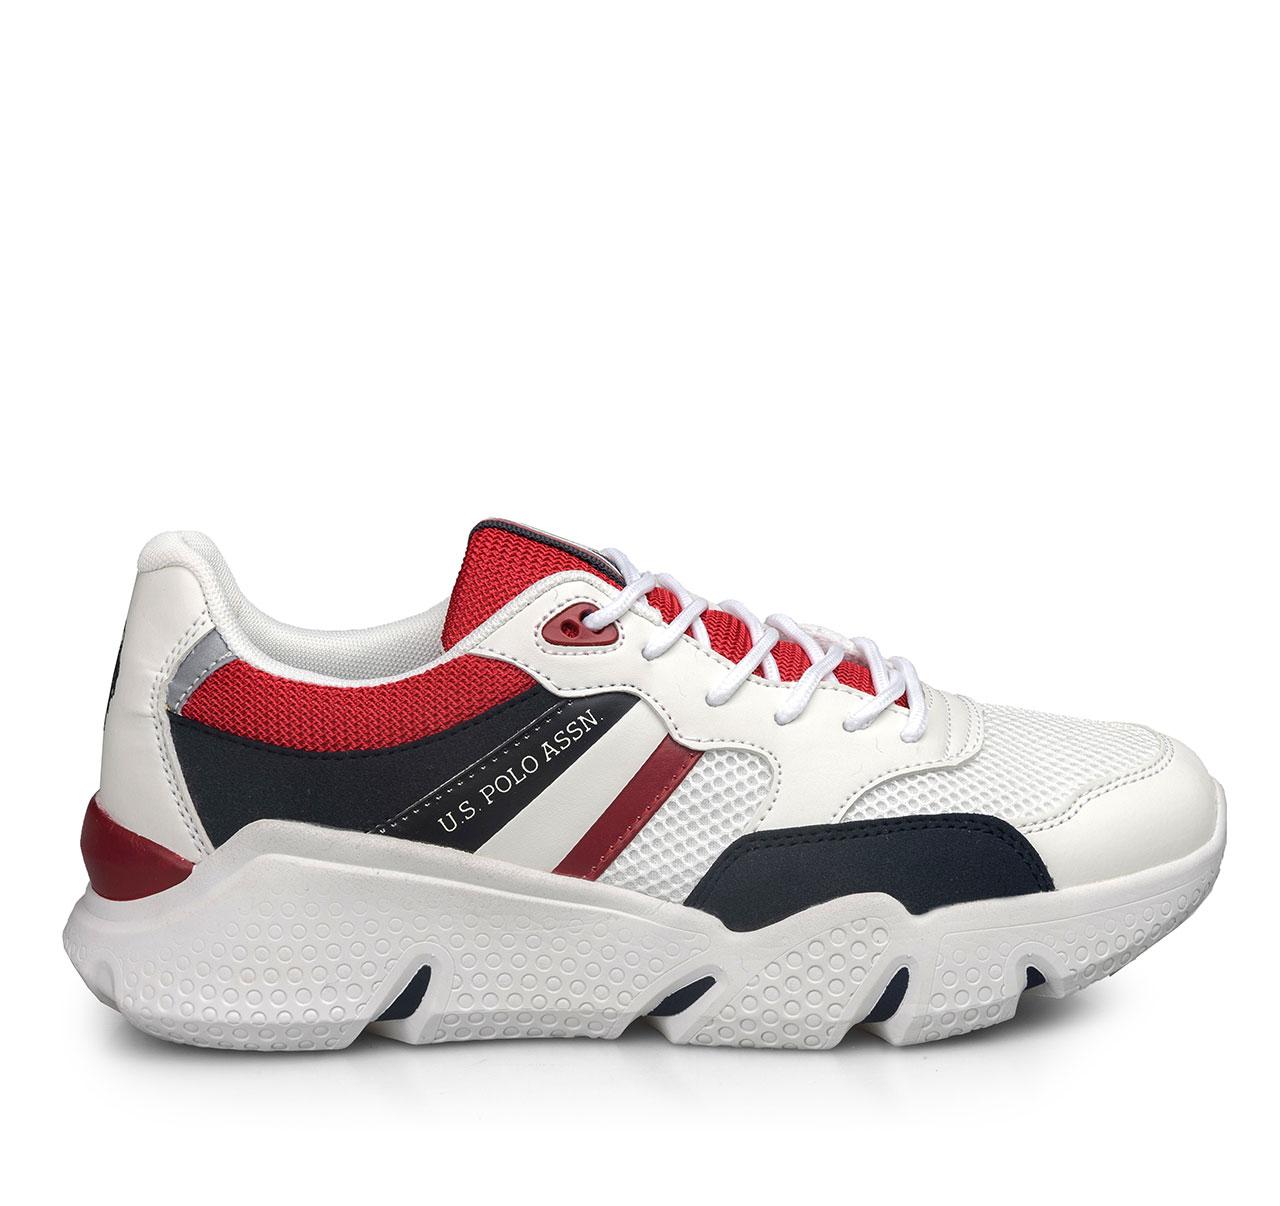 U.S.POLO sneakers